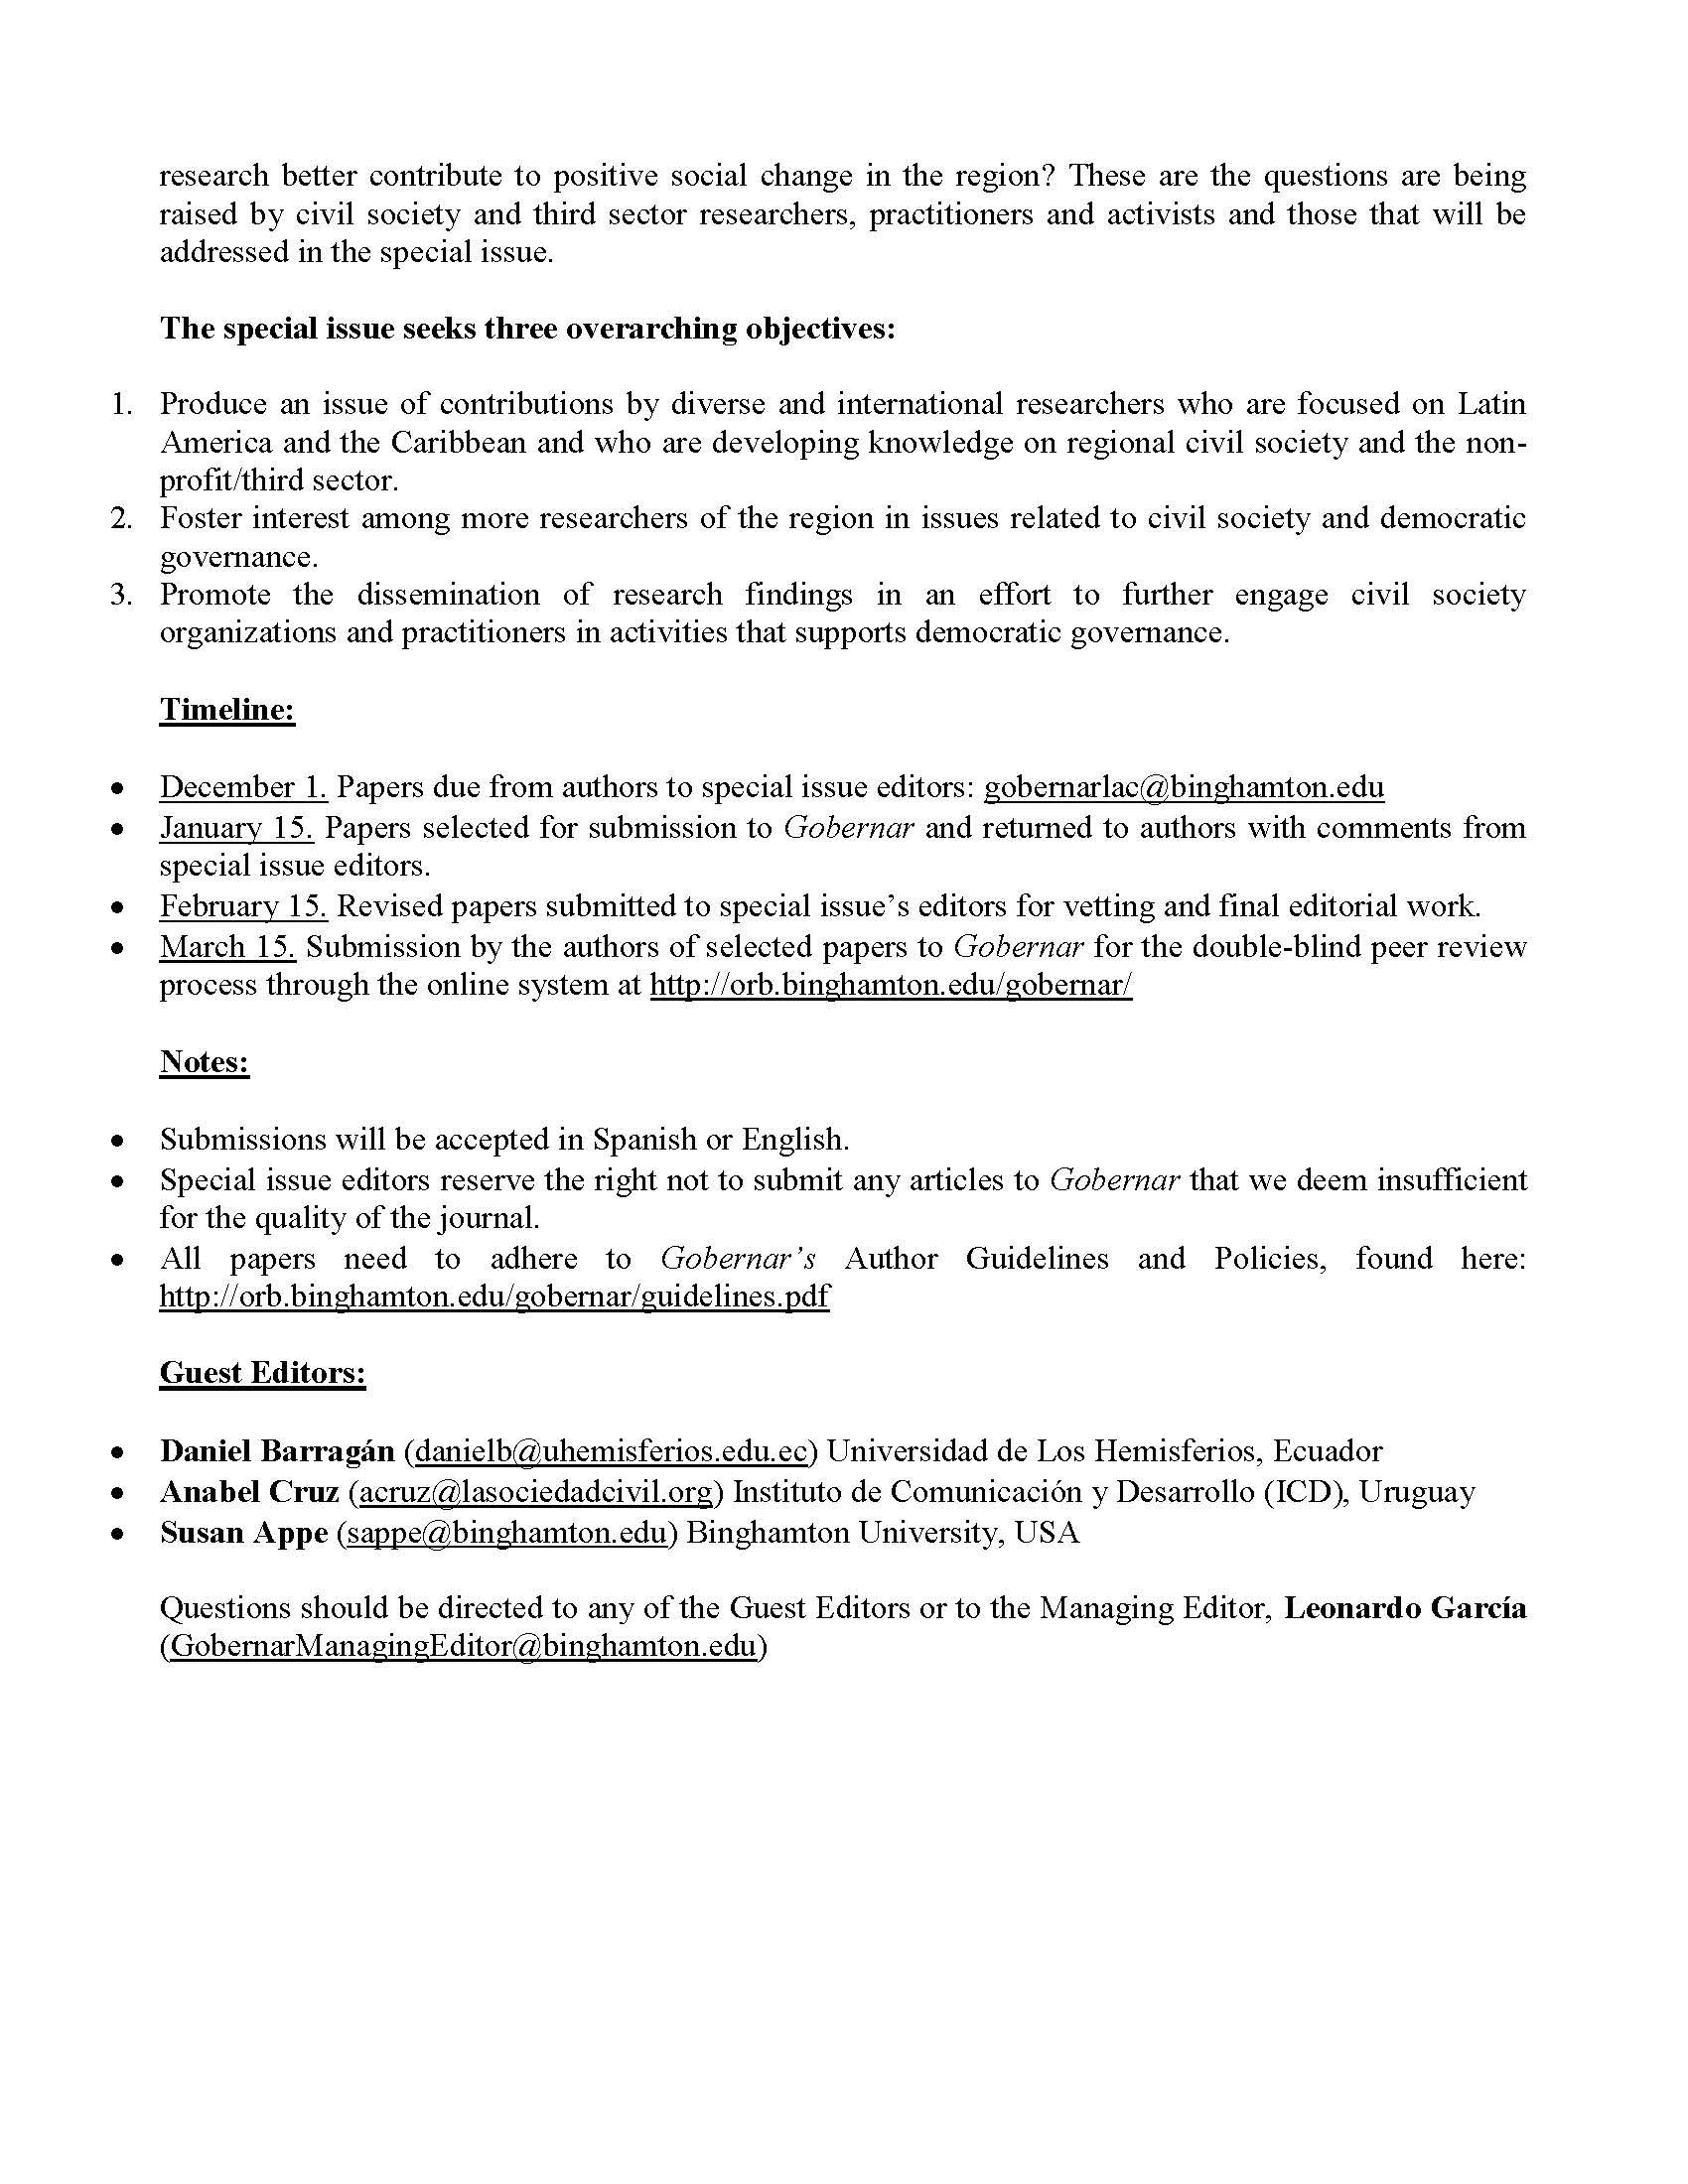 Deadline Extension December 15 Gobernar The Journal of Latin